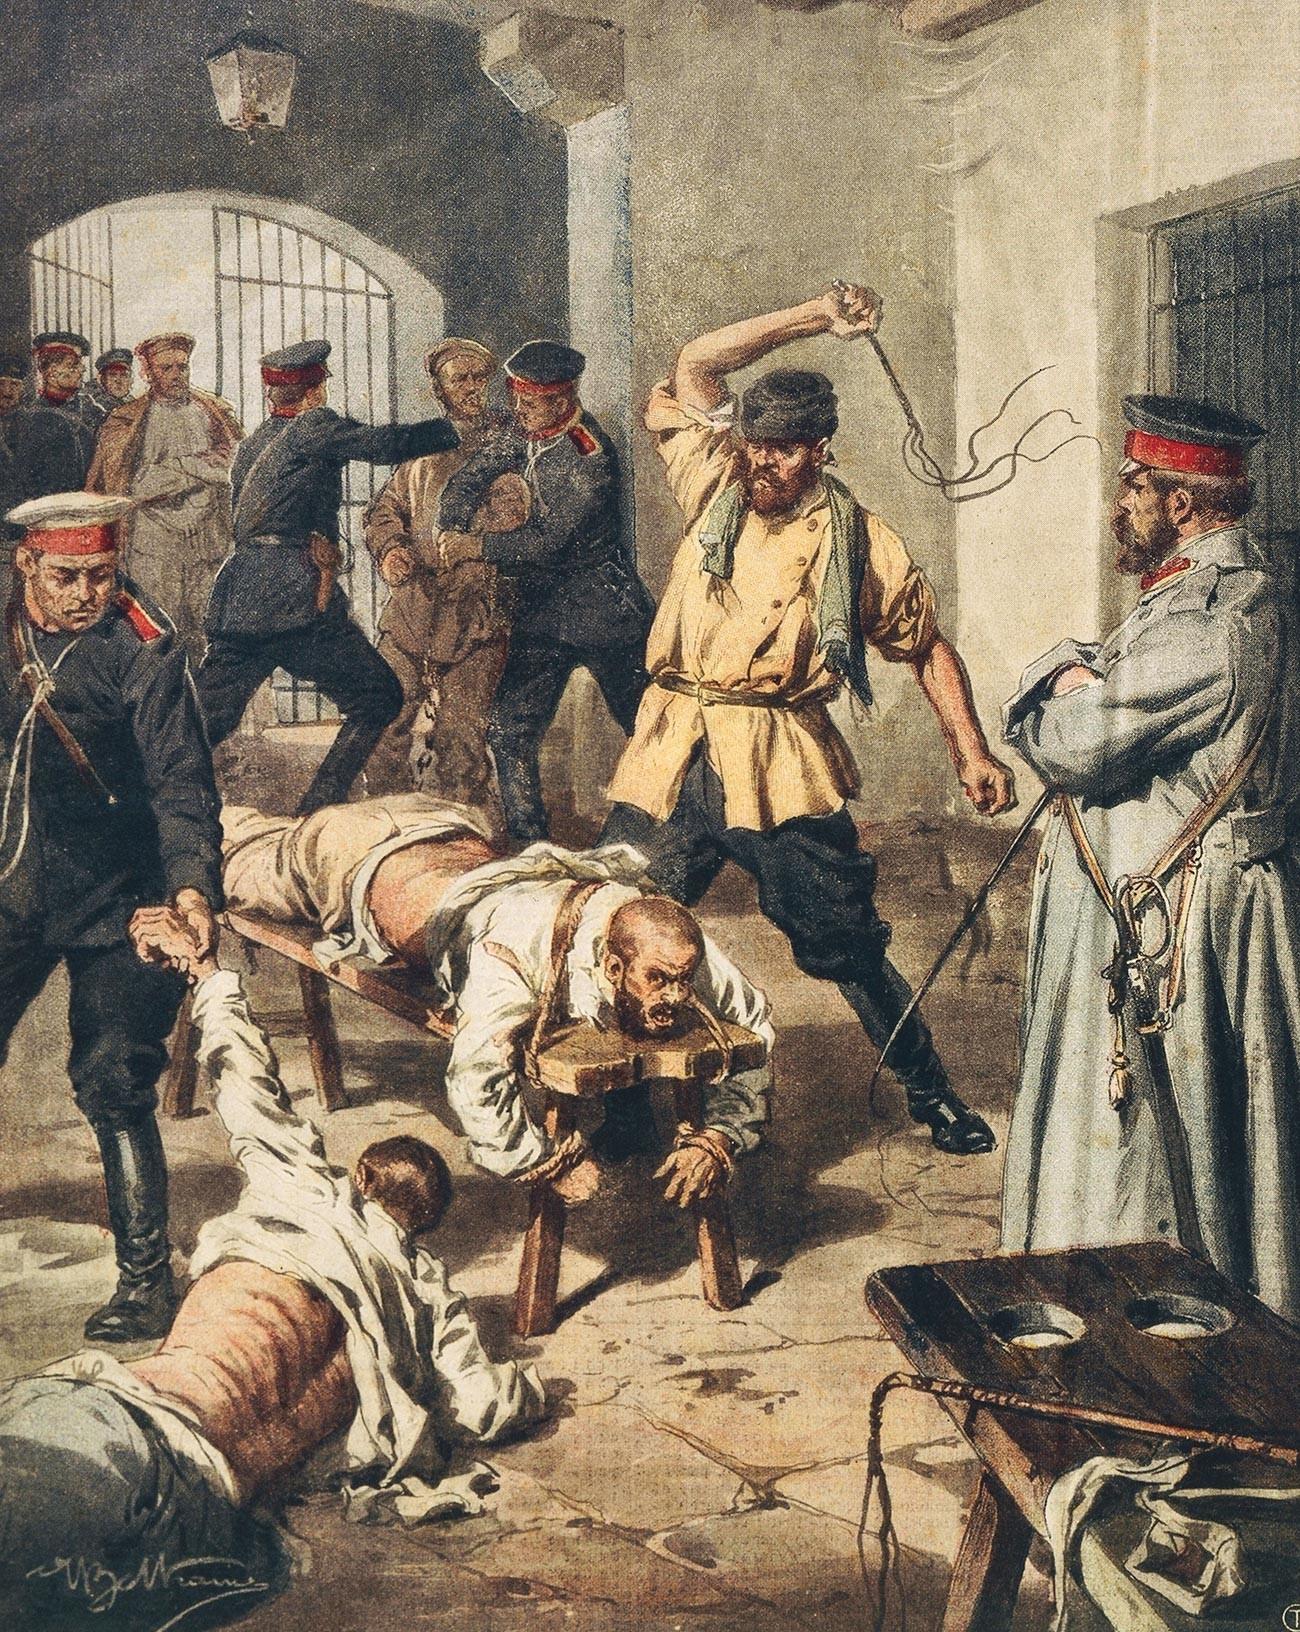 Šibanje (Achille Beltrame, La Domenica del Corriere. Grozote ruskih zaporov)